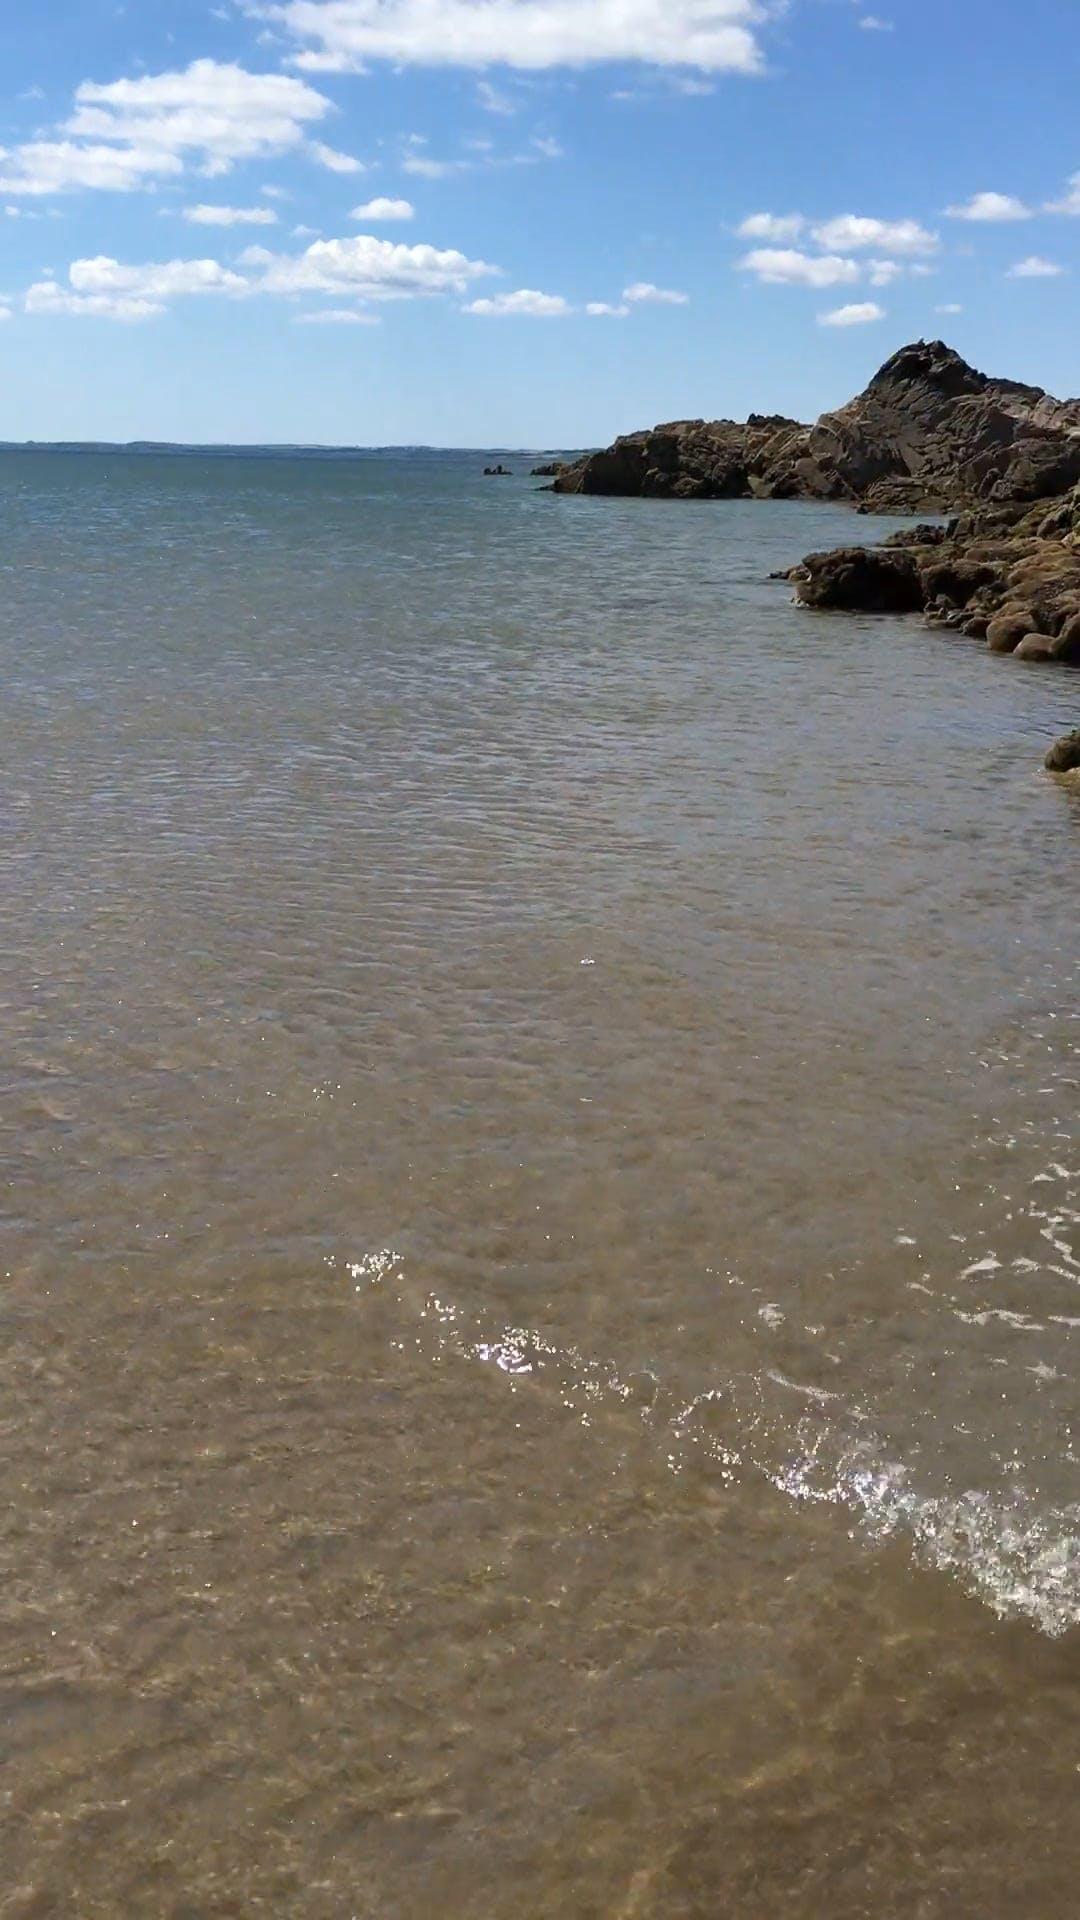 Clams On Rocks Along The Sea